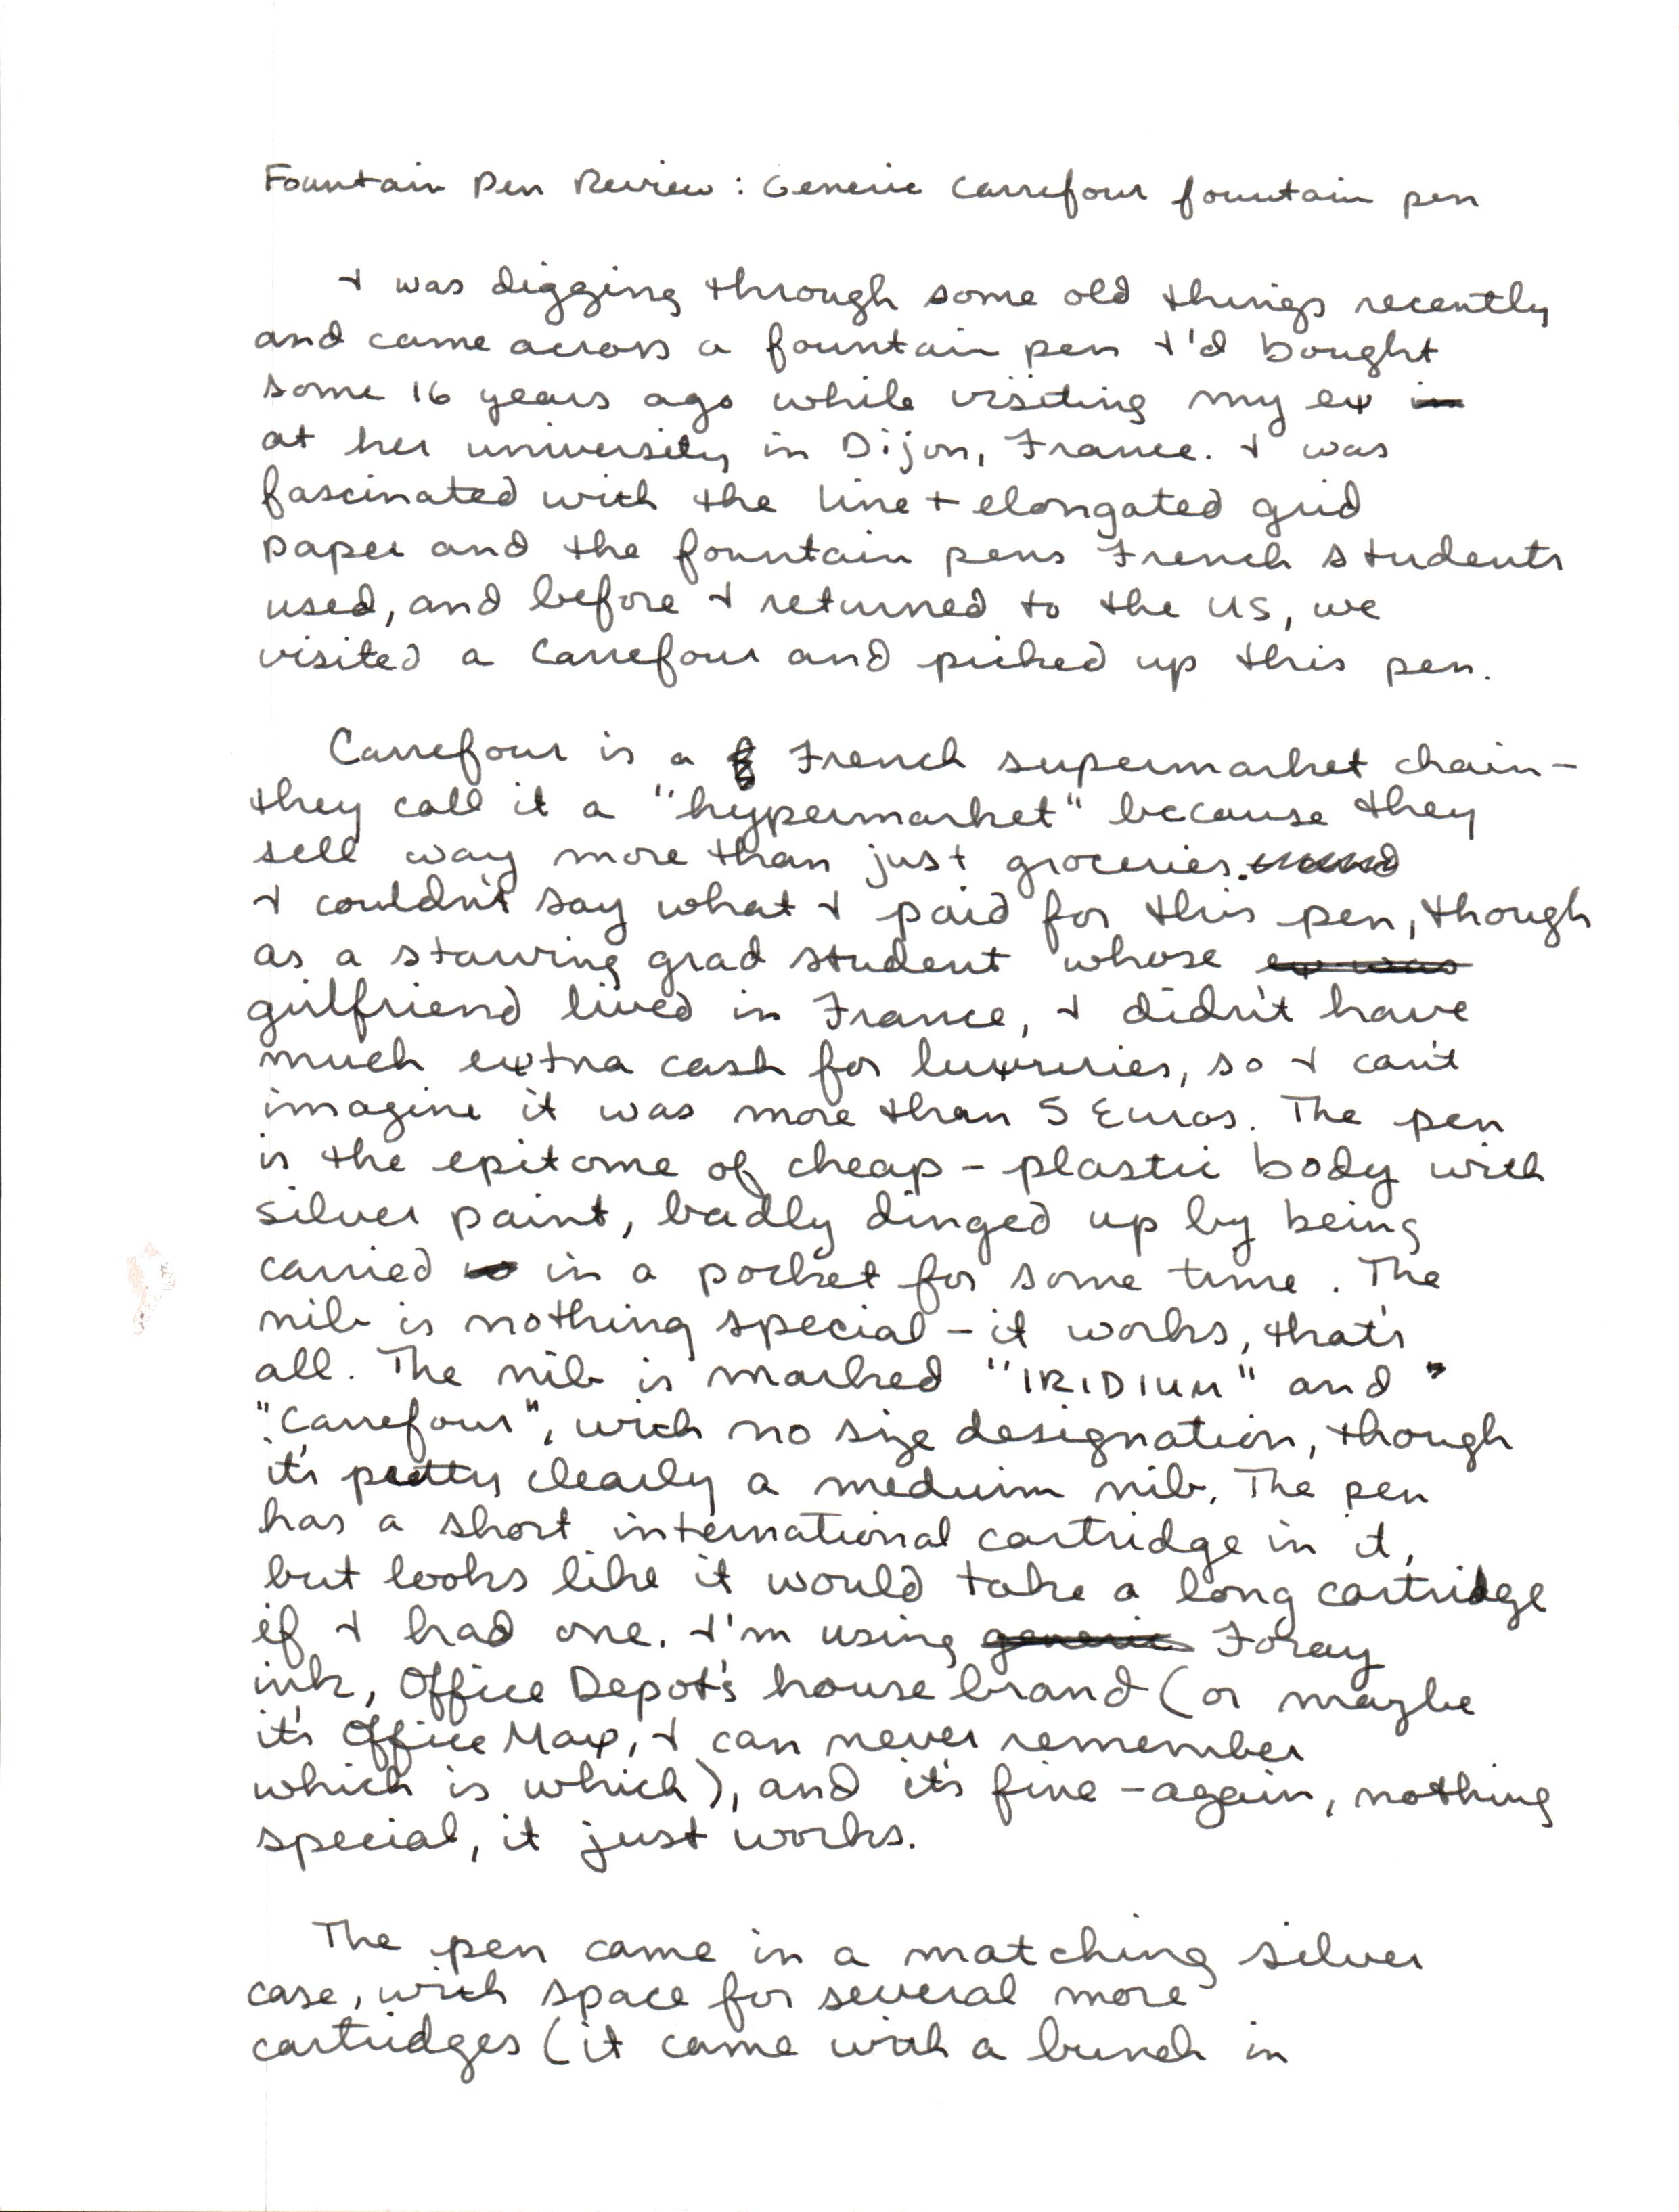 Carrefour handwritten review